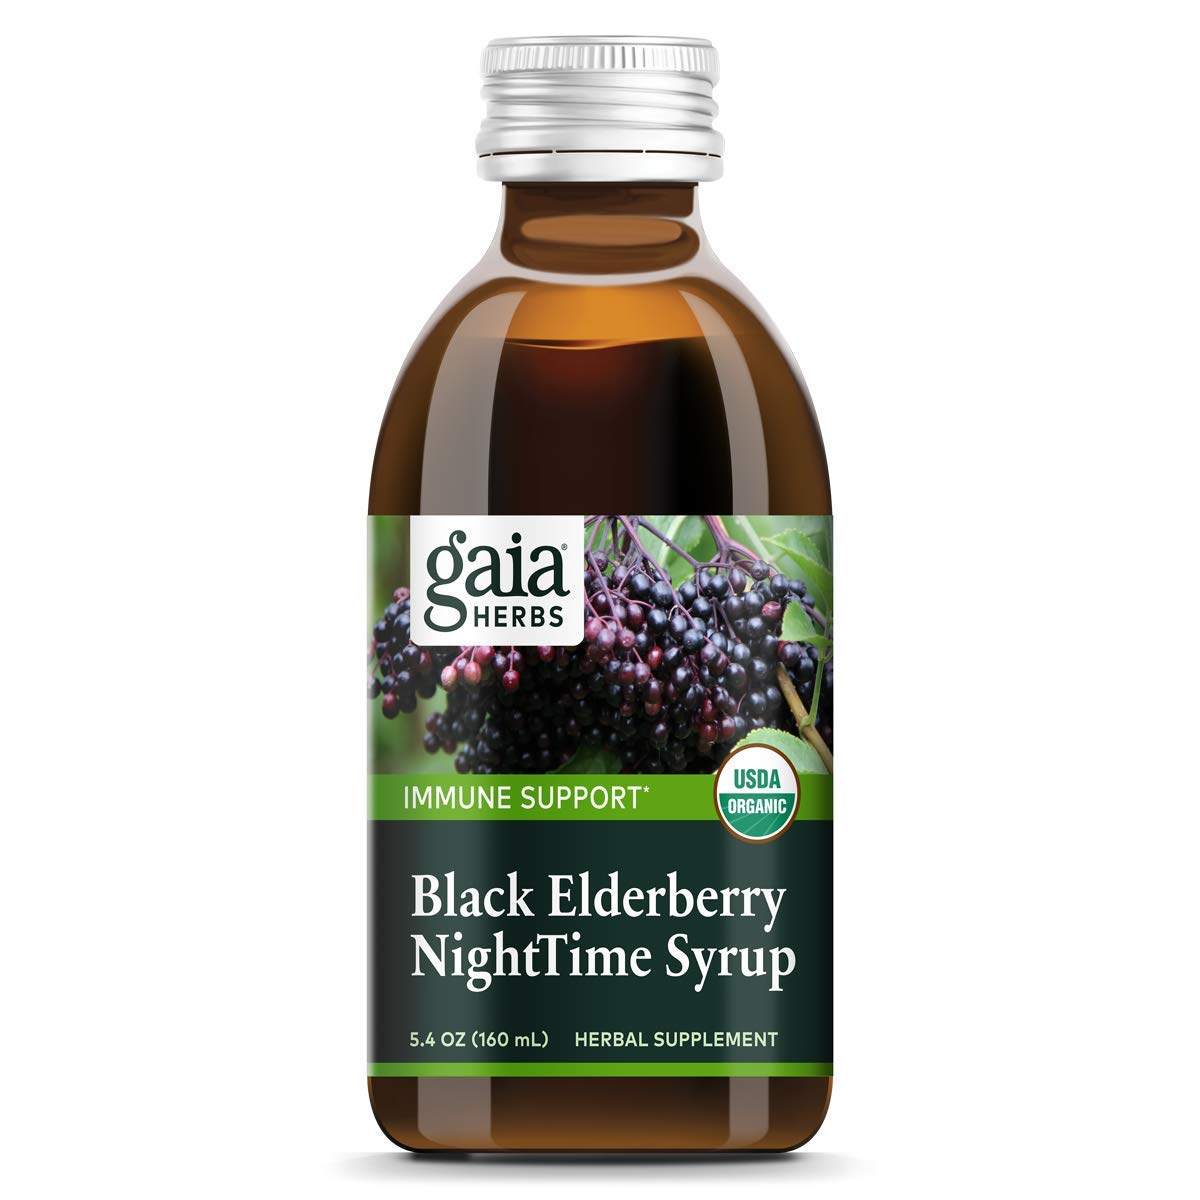 Gaia Herbs Black Elderberry NightTime Syrup, 5.4 Ounce - Immune Support for Restful Sleep, Organic Sambucus Elderberry Supplement